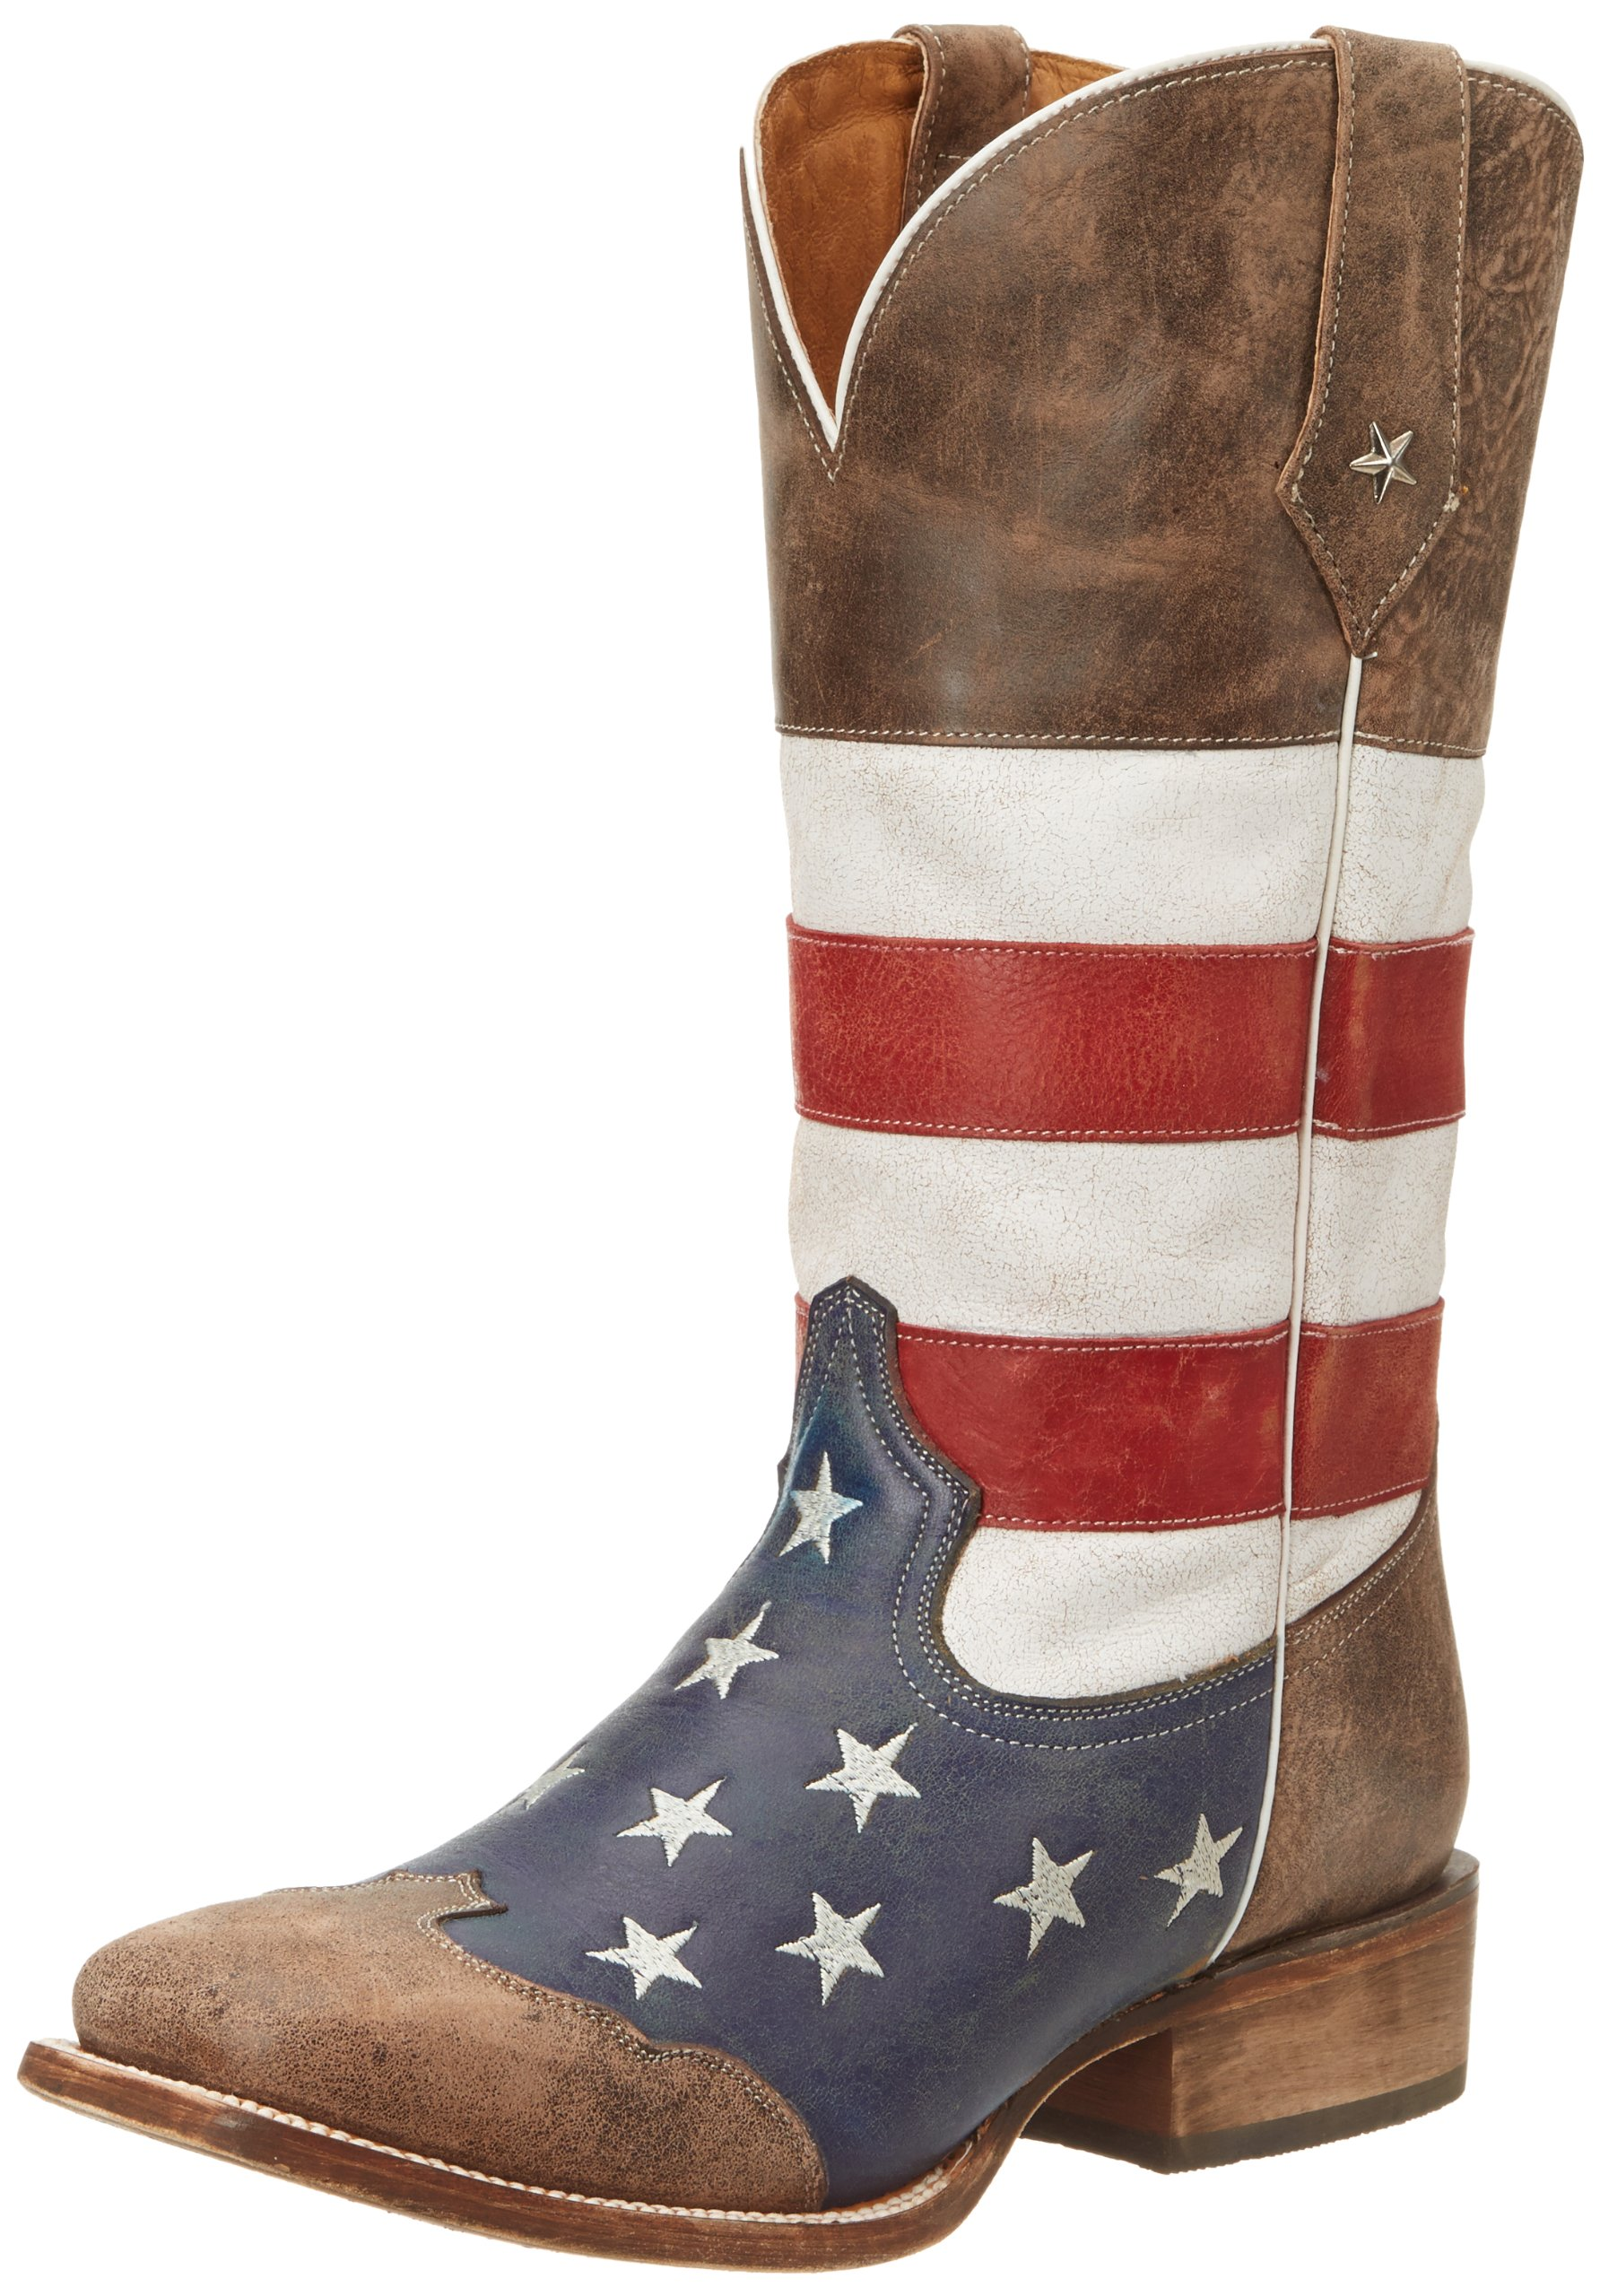 Roper Men's American Flag Square Toe Boot Brown 10.5 EE - Wide